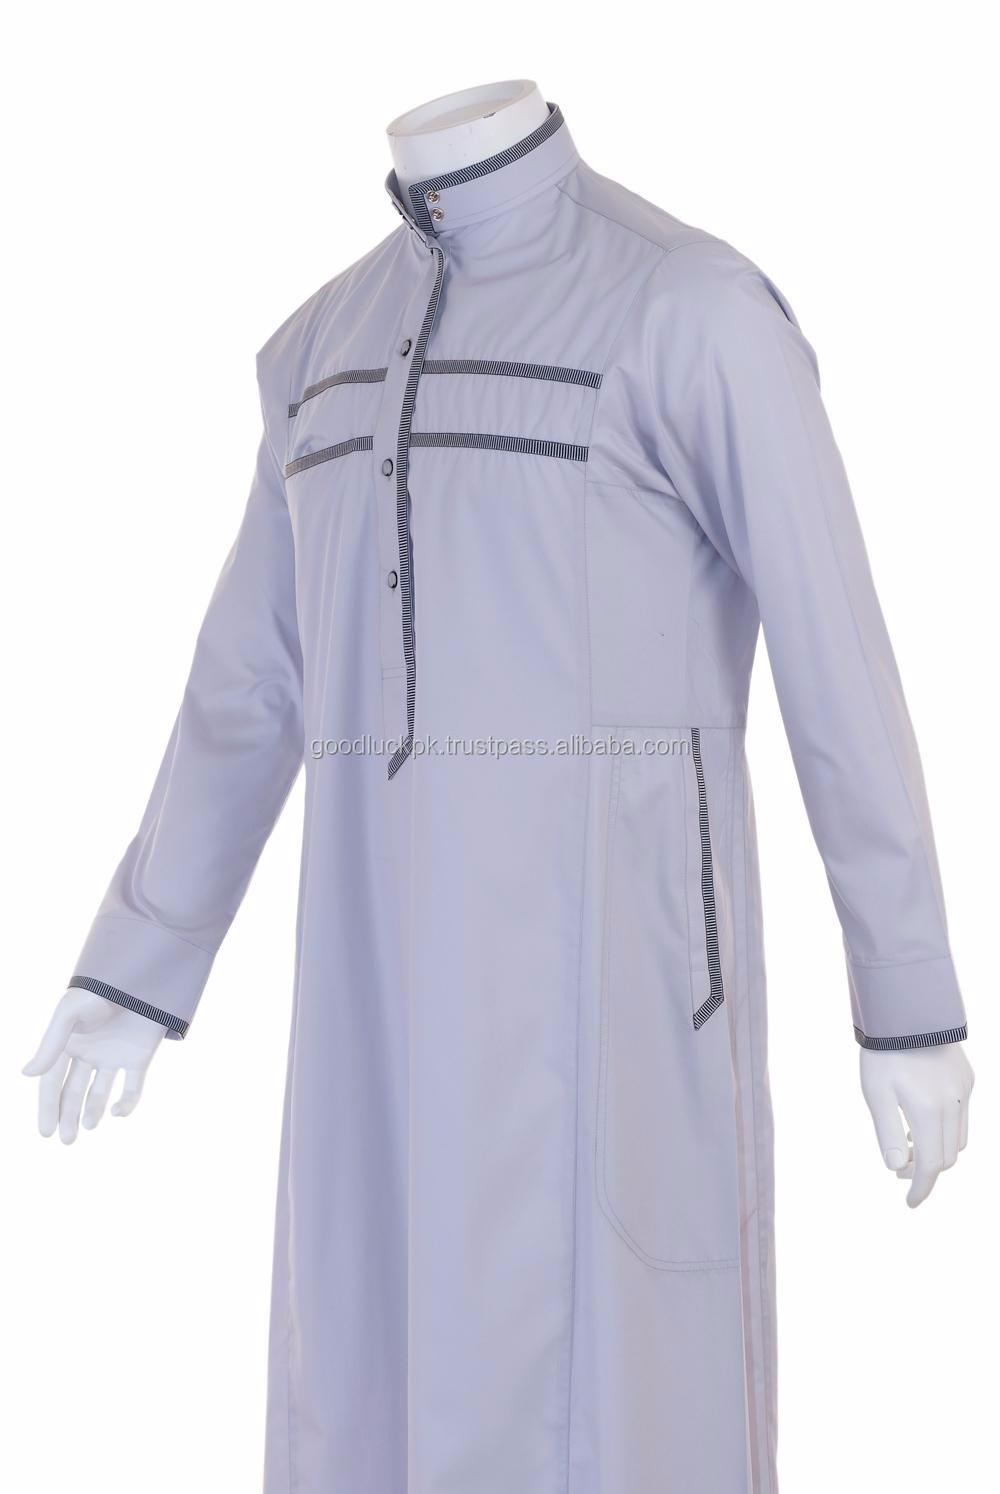 Wholesale Thobe -designer Arabic Thobe/designer Men's Arabic Thobe ...